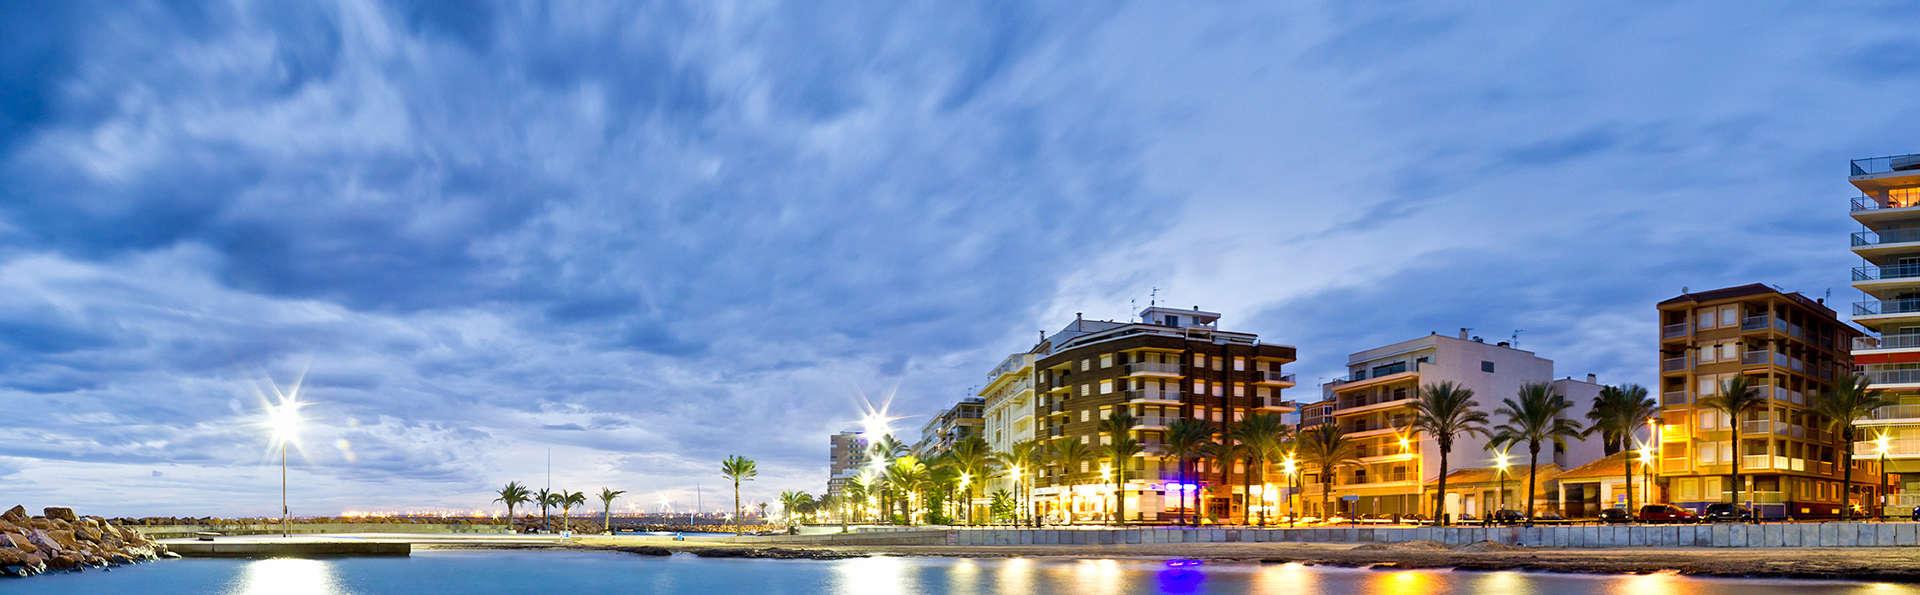 Hotel Masa International - EDIT_destination.jpg